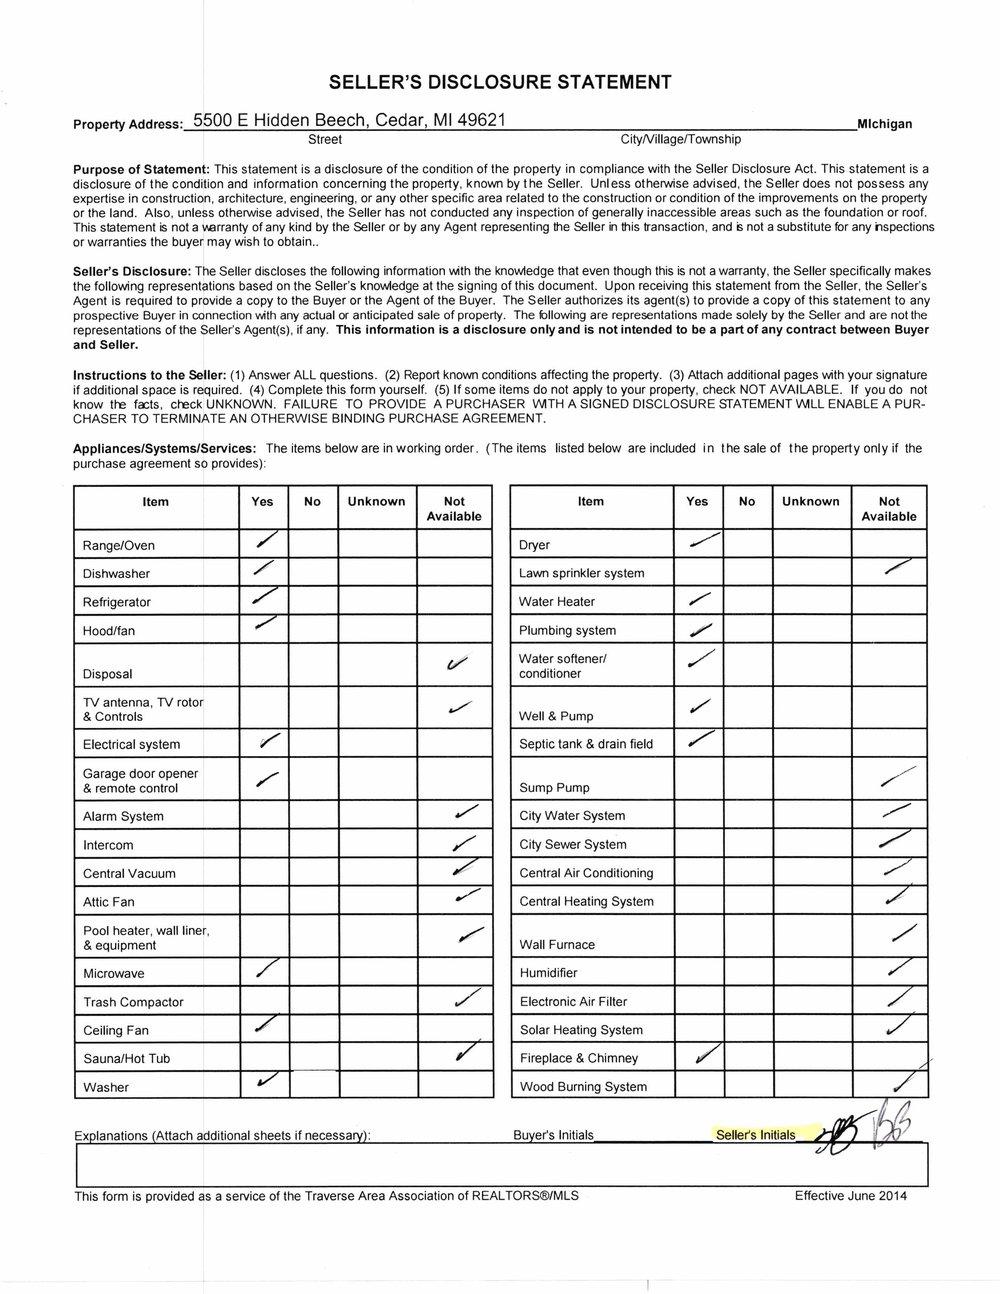 5500 E Hidden Beech, Cedar, MI - For sale by Oltersdorf Realty LLC - Marketing Packet (12).jpg